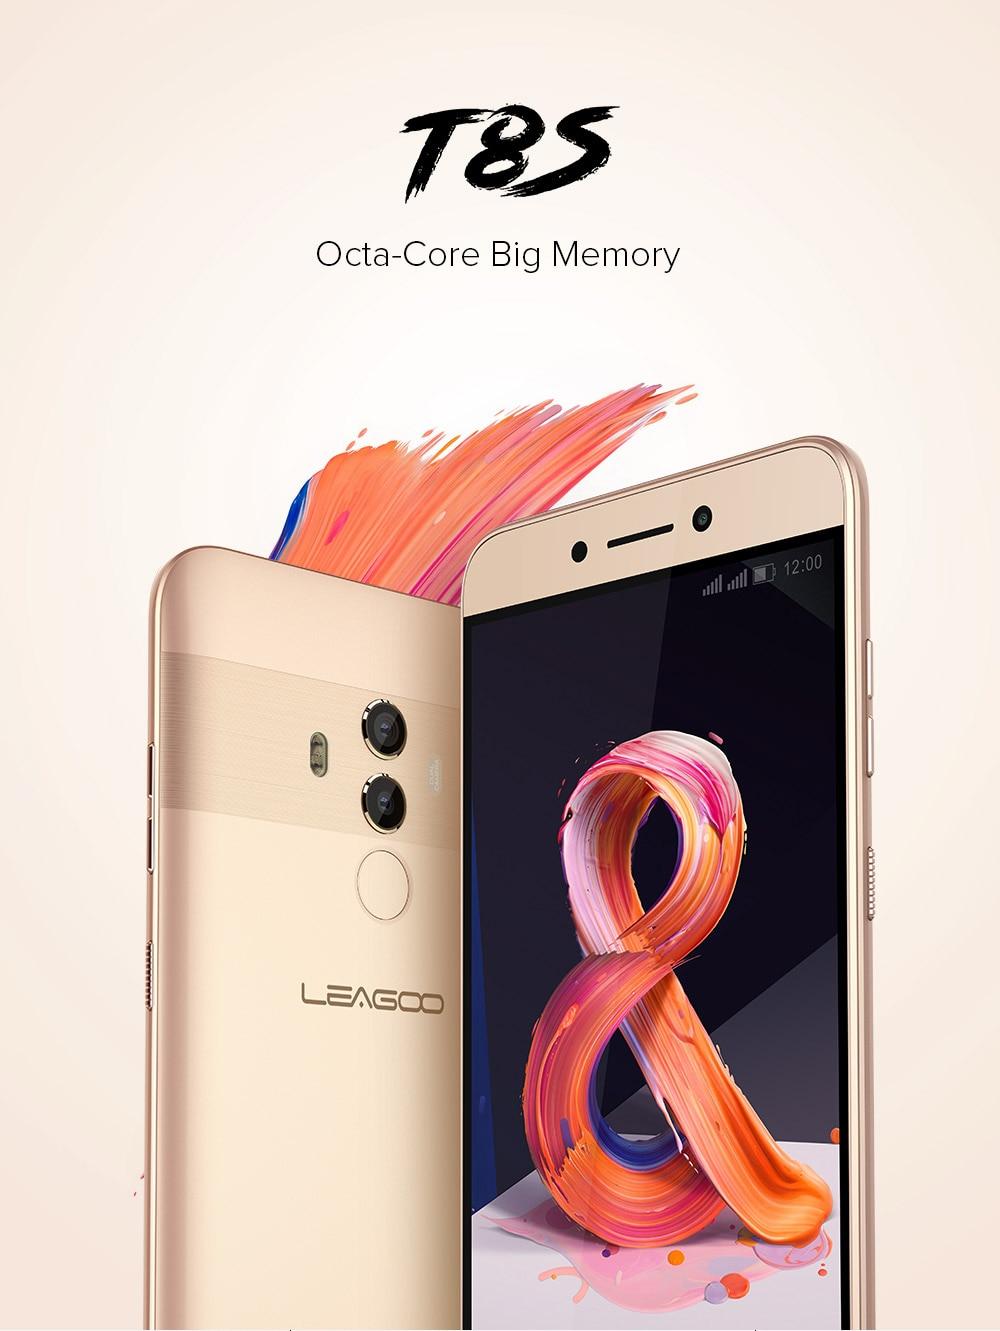 FHD 4G LEAGOO Smartphone